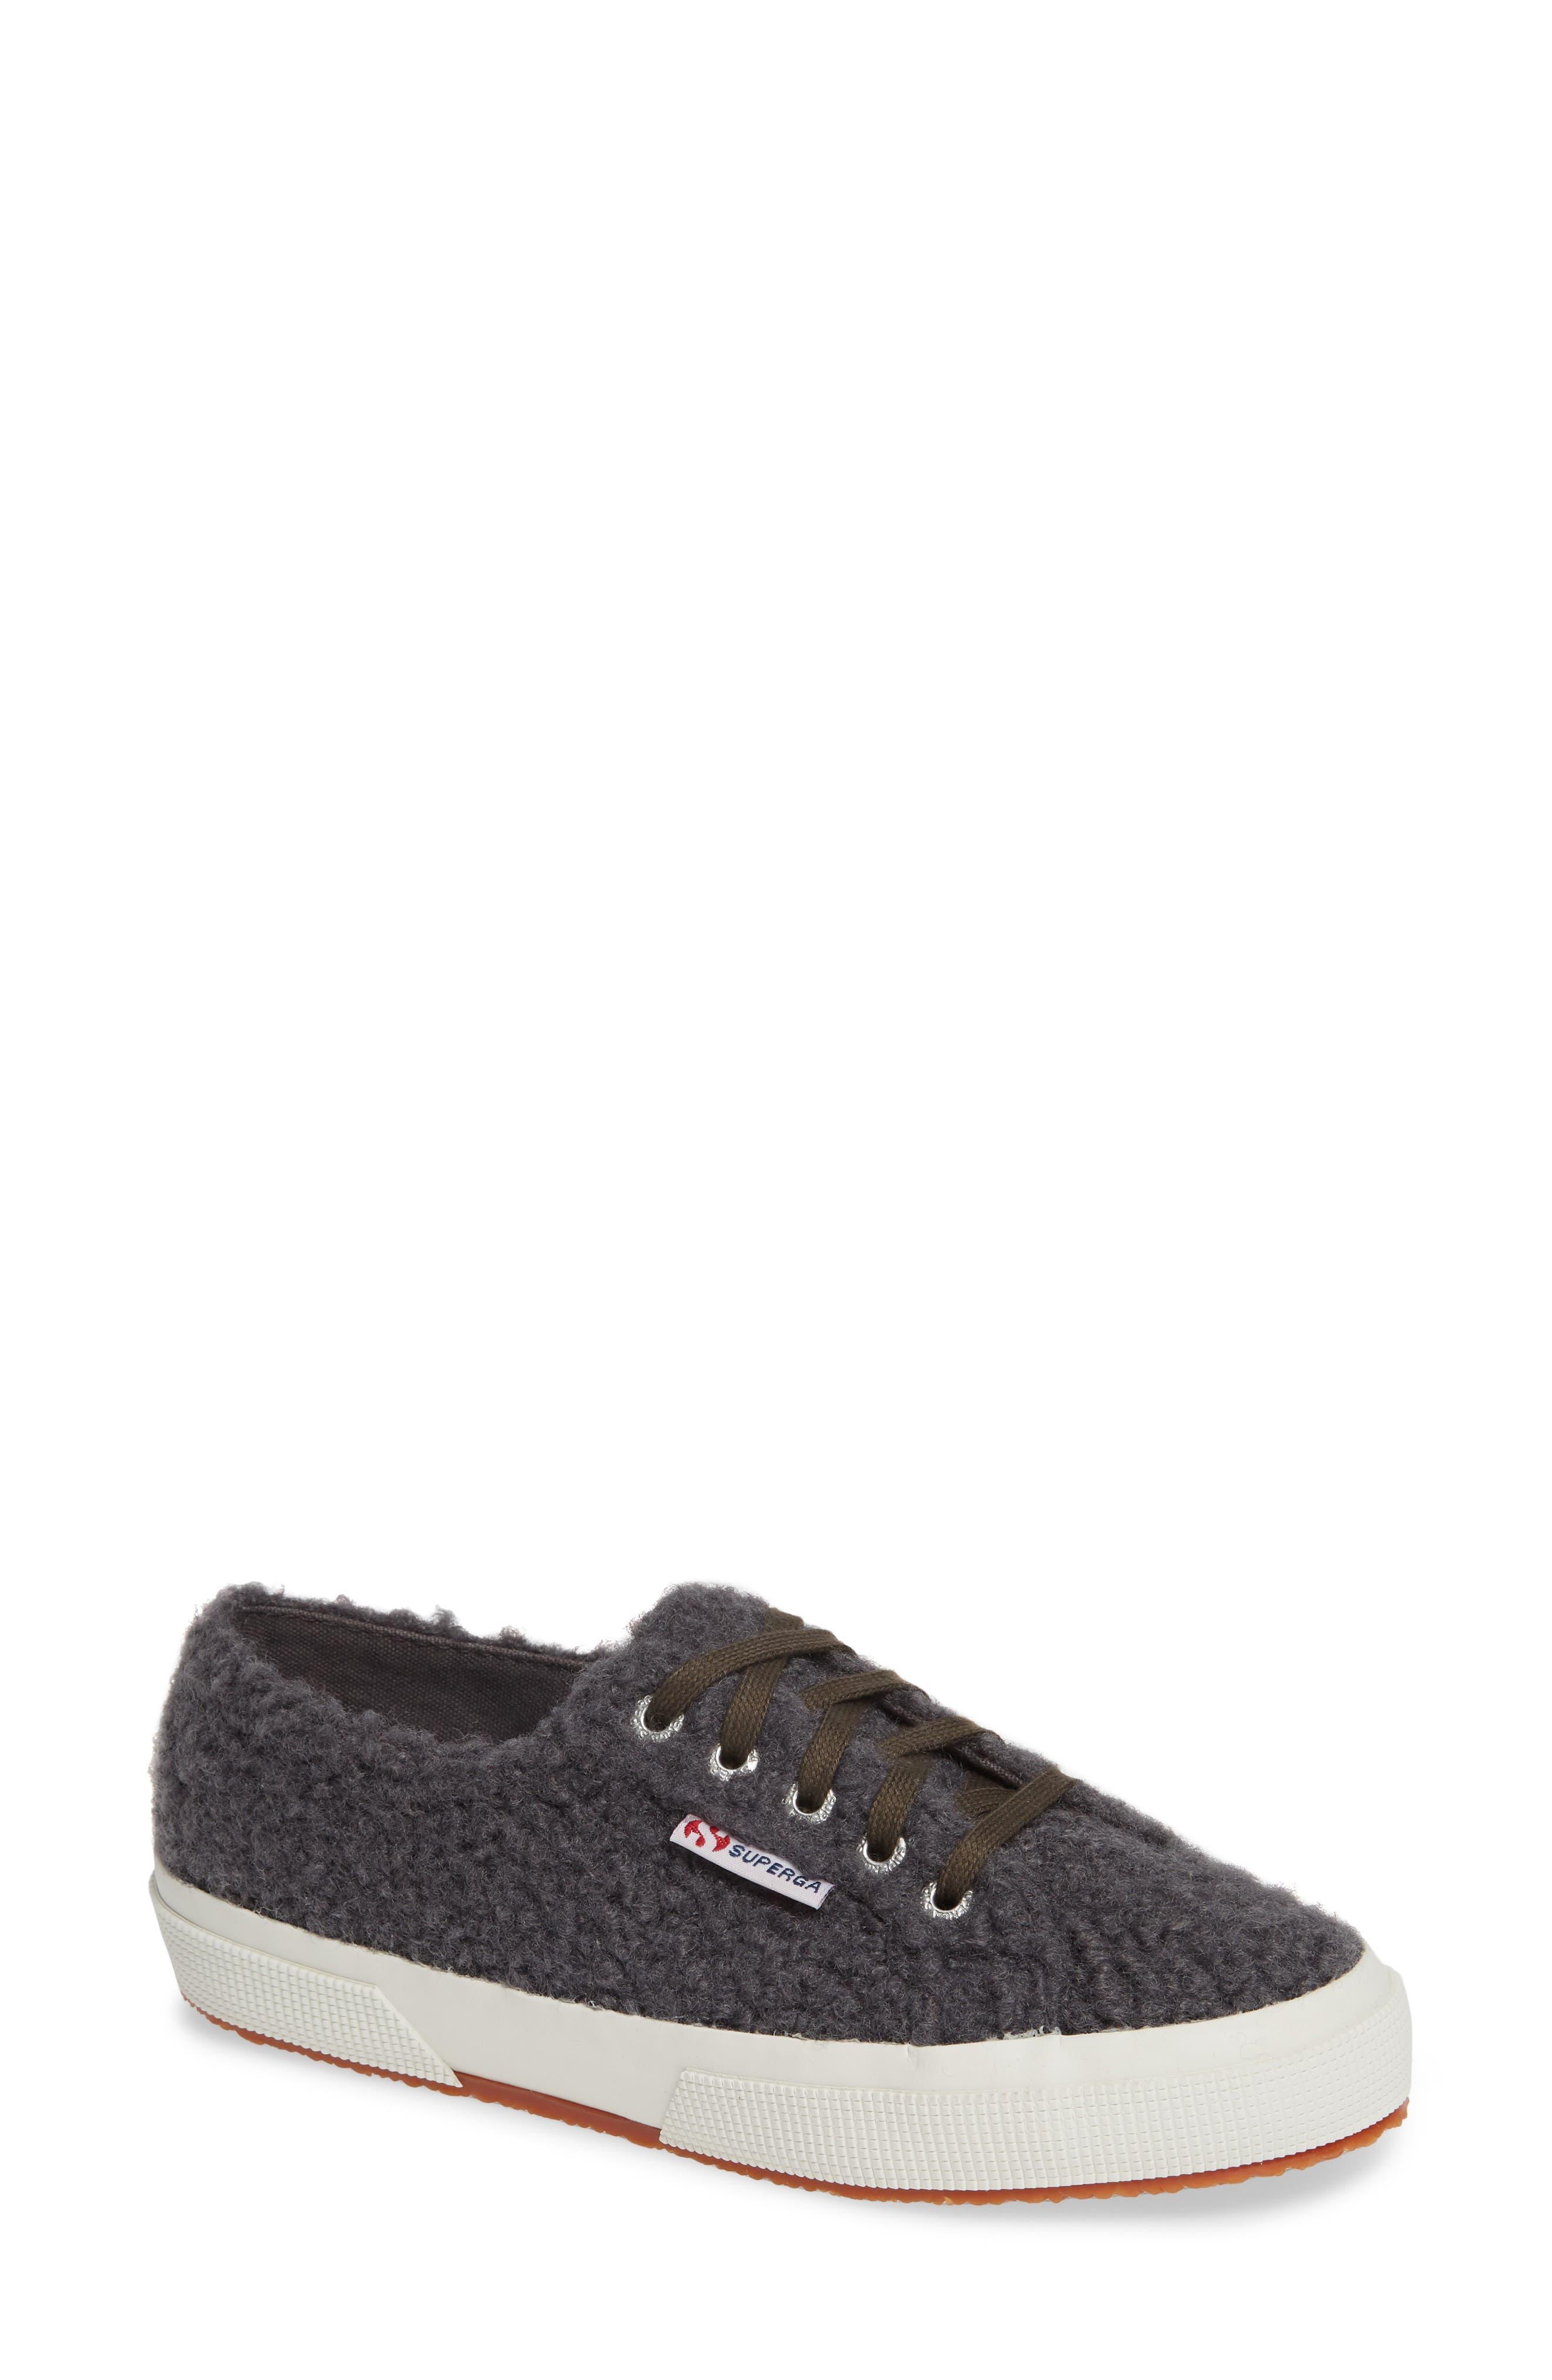 2759 Curly Wool Sneaker,                             Main thumbnail 1, color,                             DARK GREY/ GREY